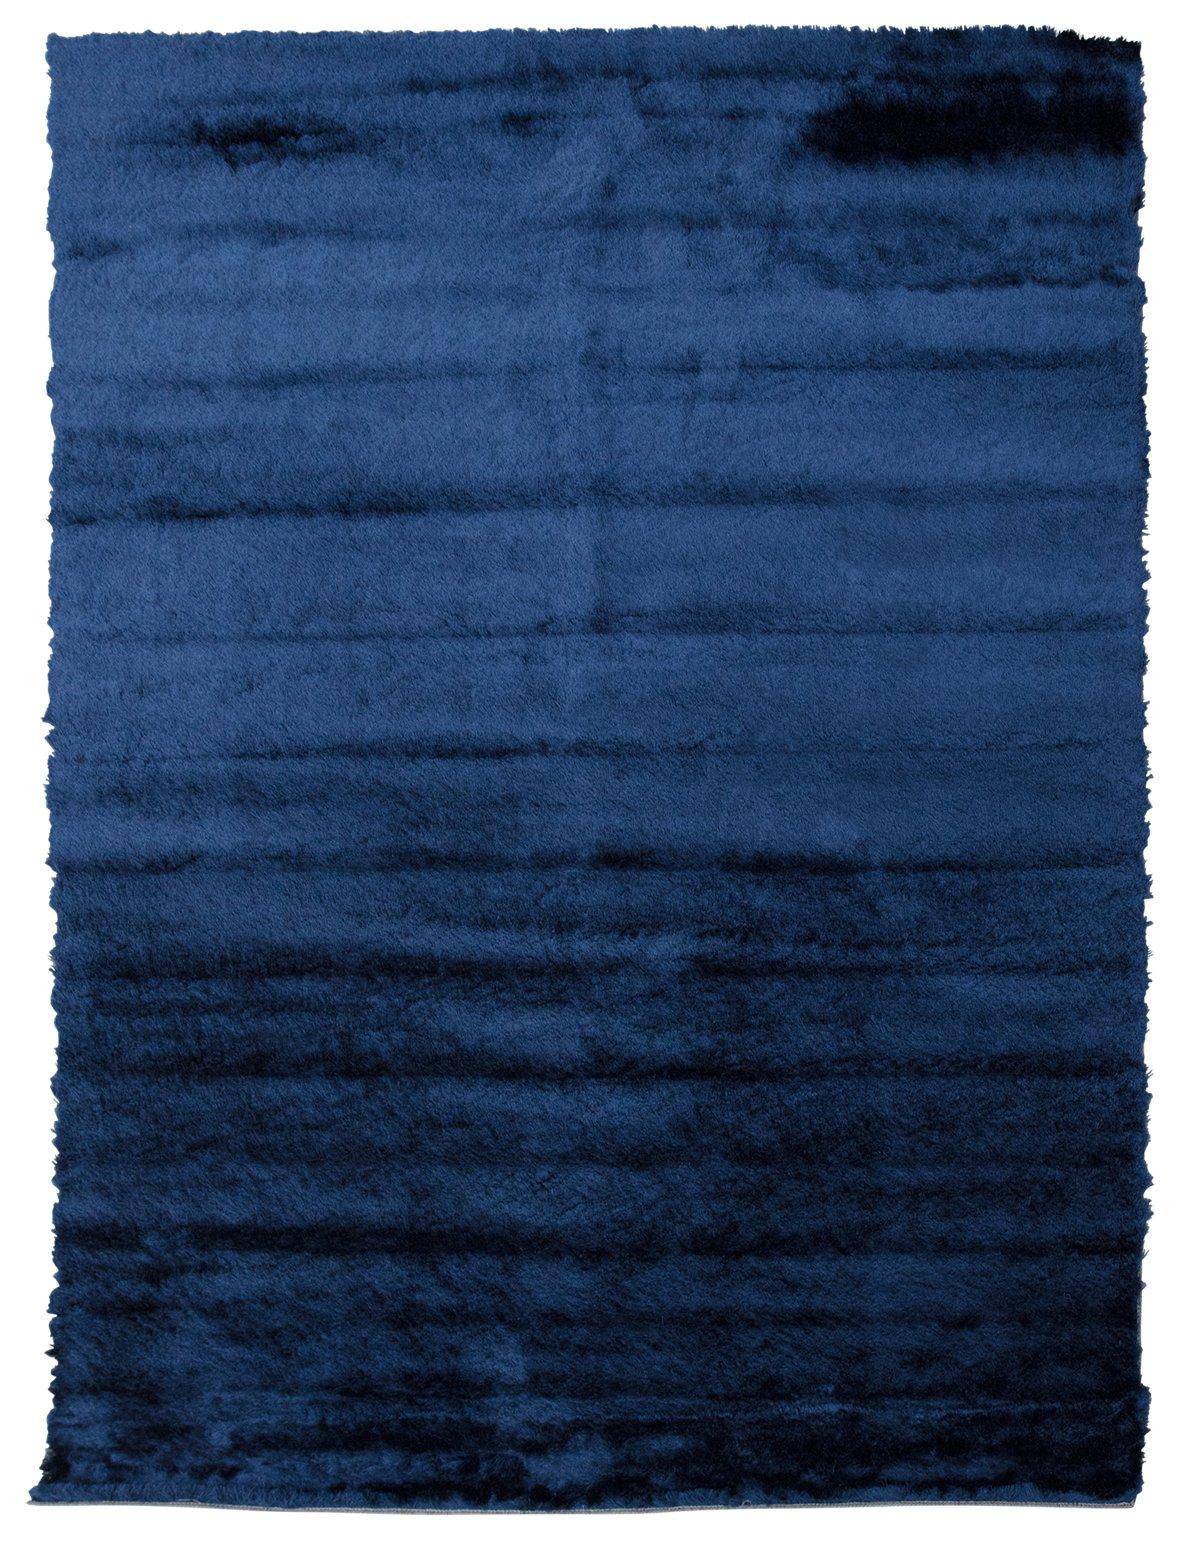 city furniture: allure blue 5x8 area rug 5x8 Area Rugs